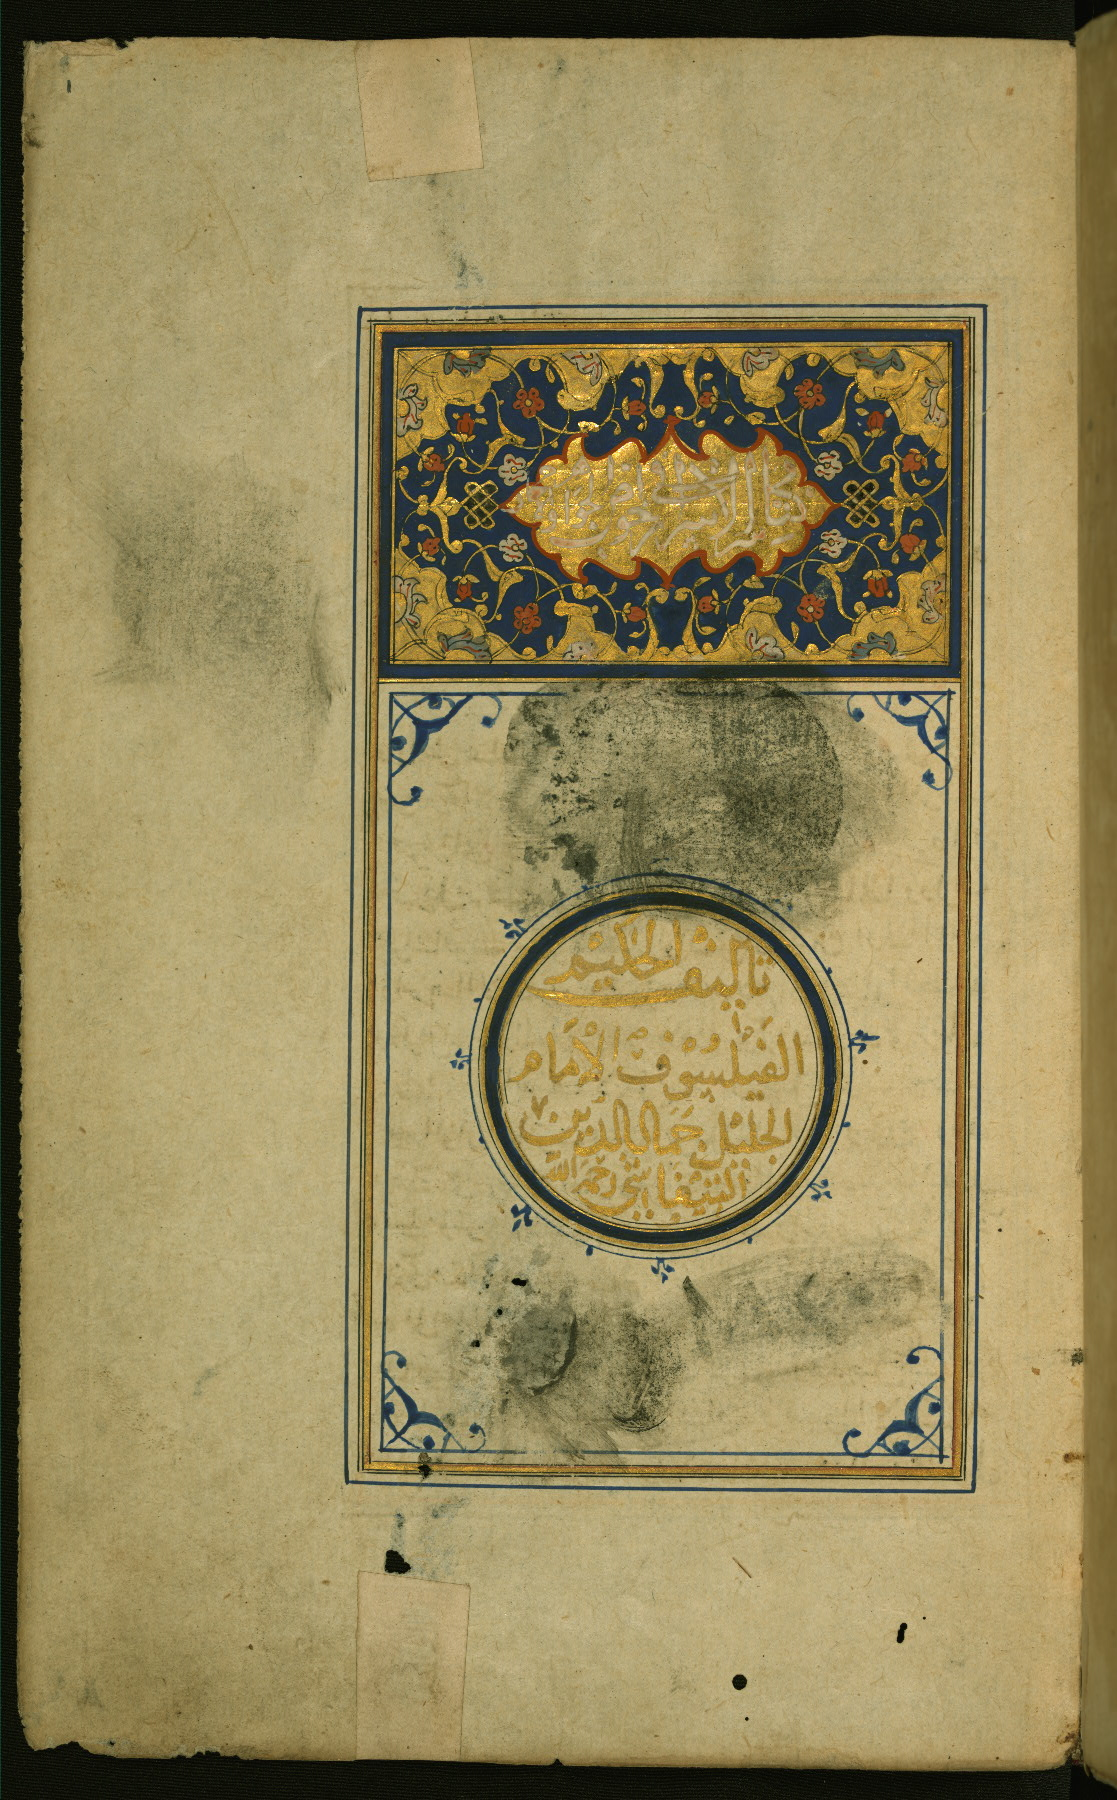 Walters Ms. W.589, Two works on precious stones